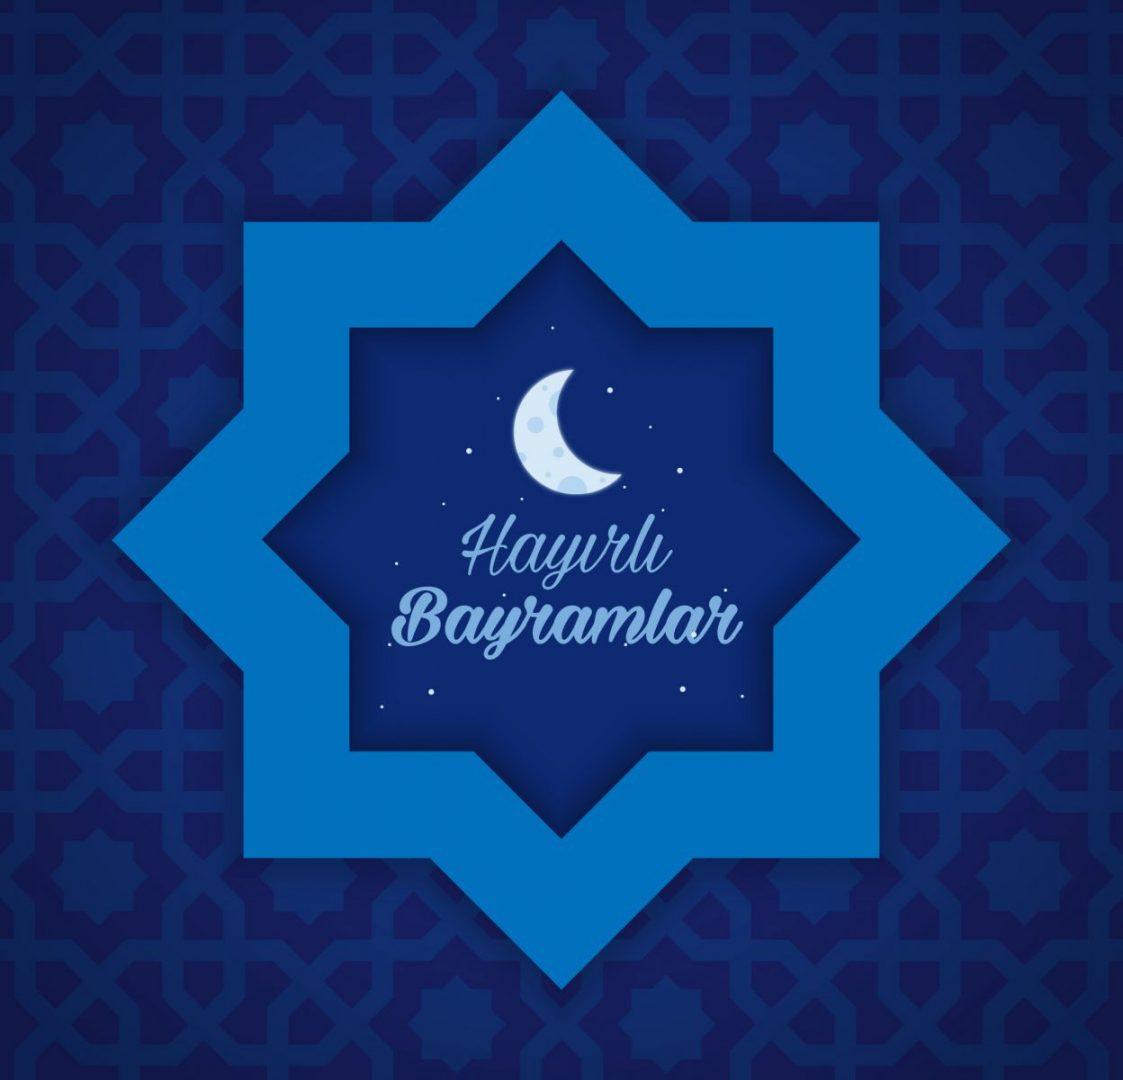 ramazan bayrami mesajlari 08 1123x1080 - Ramazan Bayramı Mesajları 2020